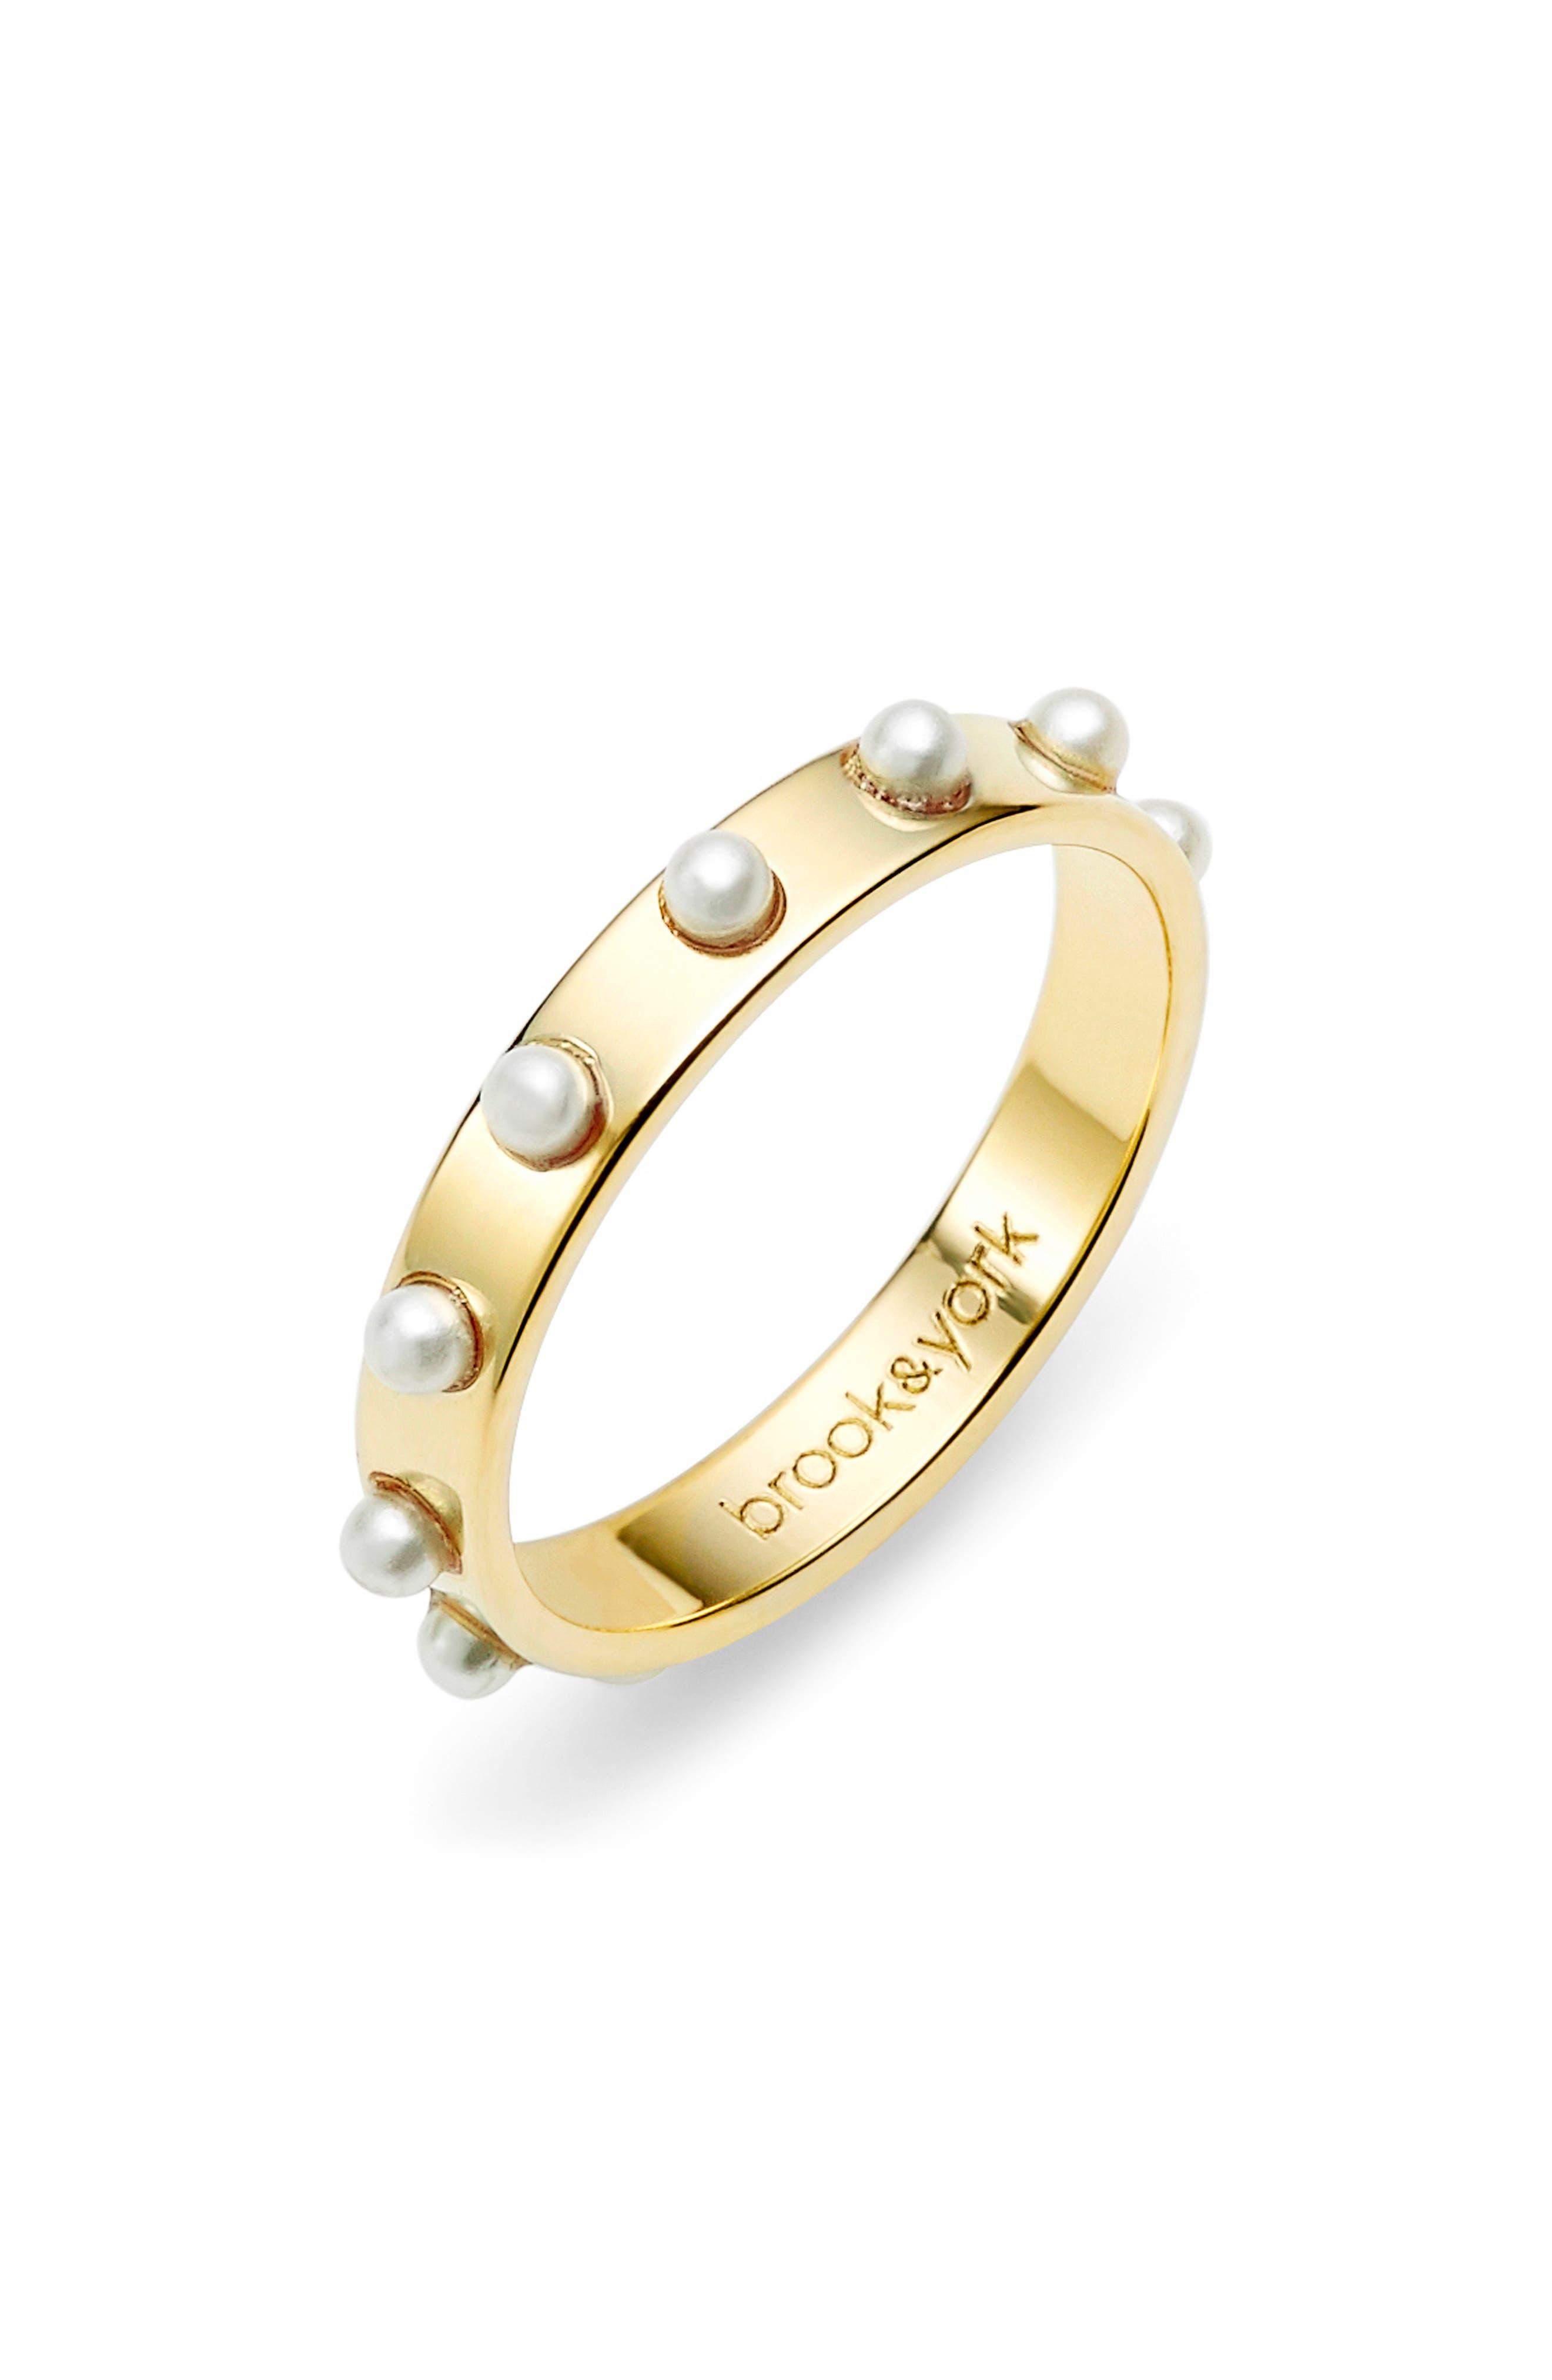 Holly Imitation Pearl Ring